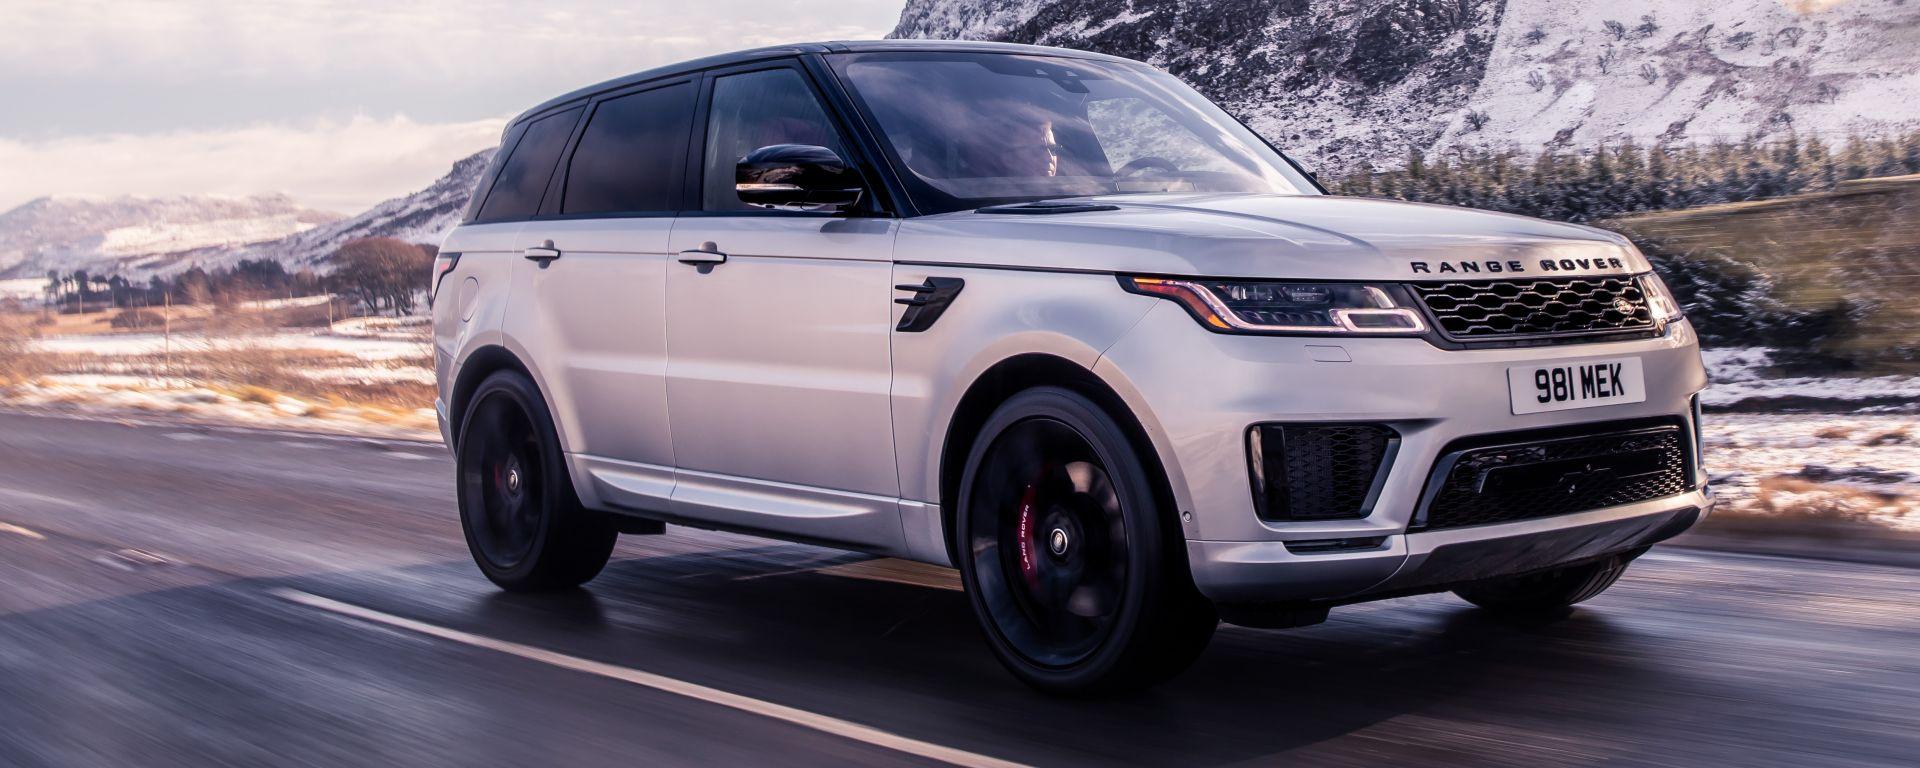 Range Rover Sport HST 2019: la prima mild hybrid